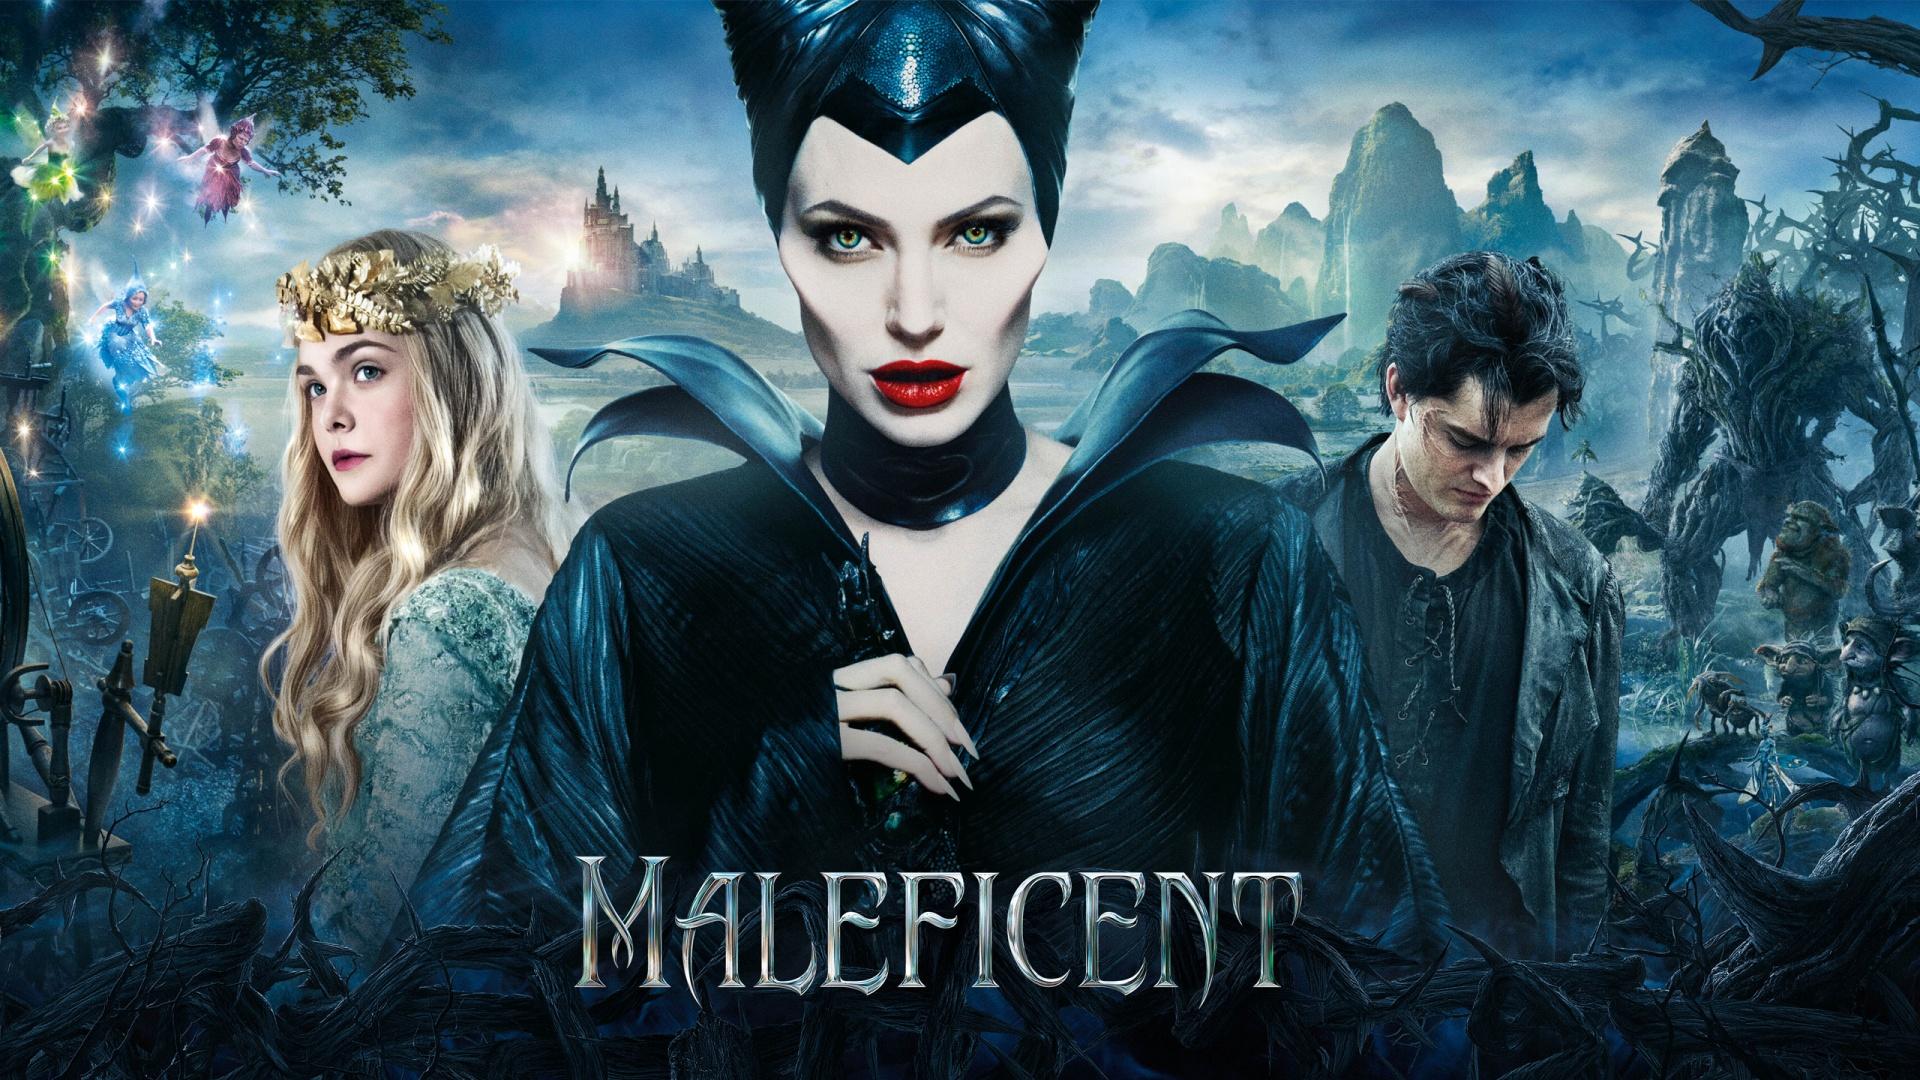 Maleficent wallpaper 2